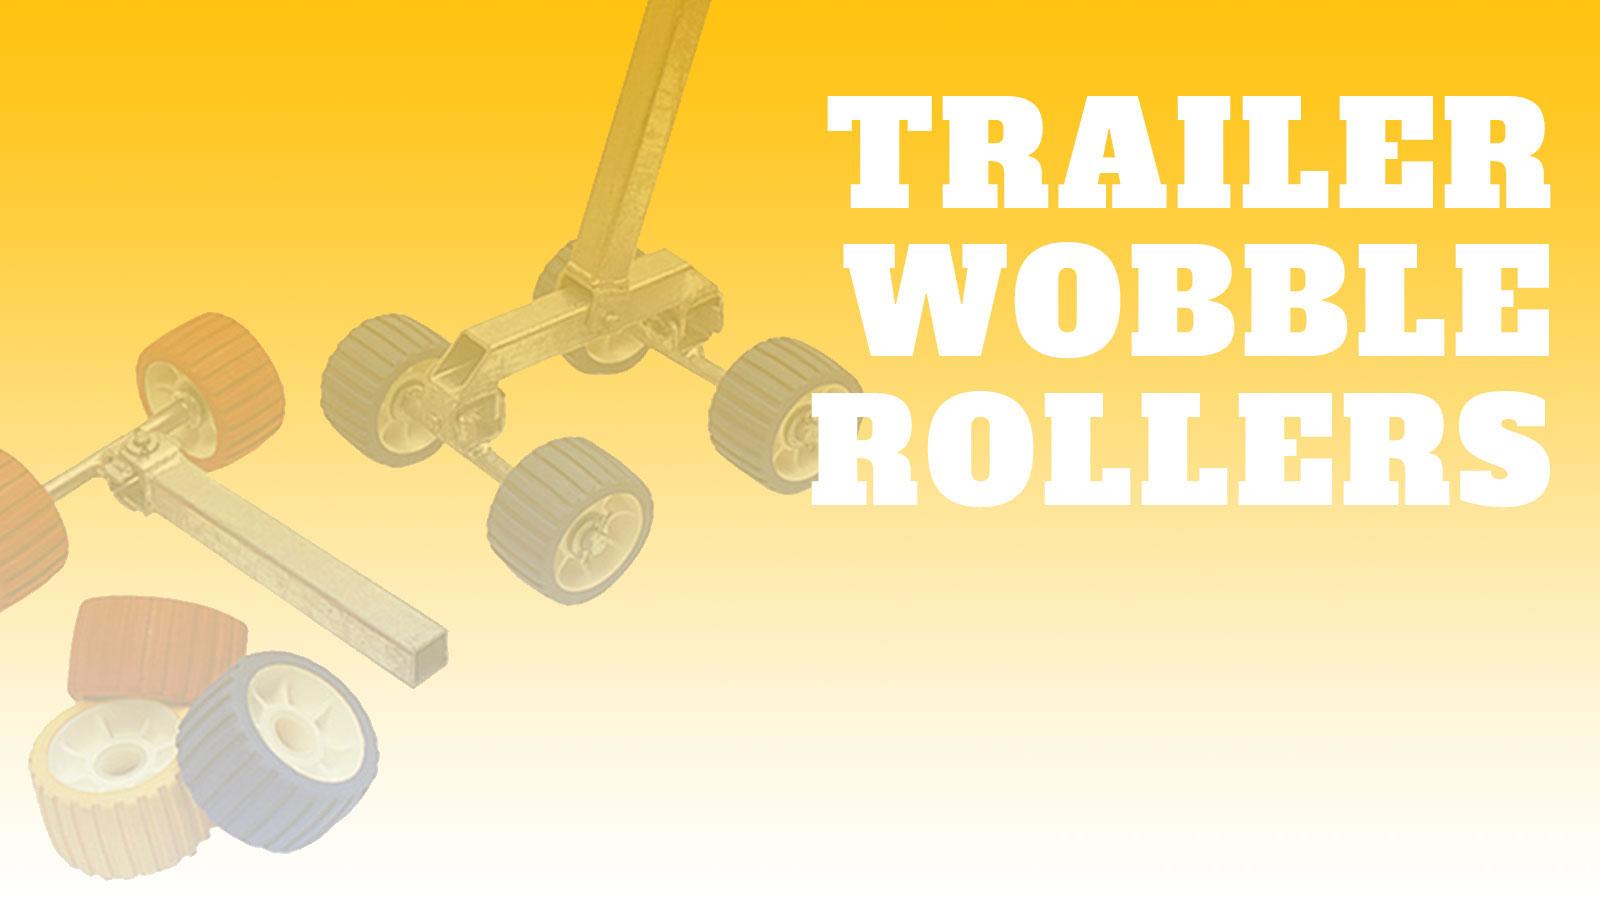 Trailer-Wobble-Rollers